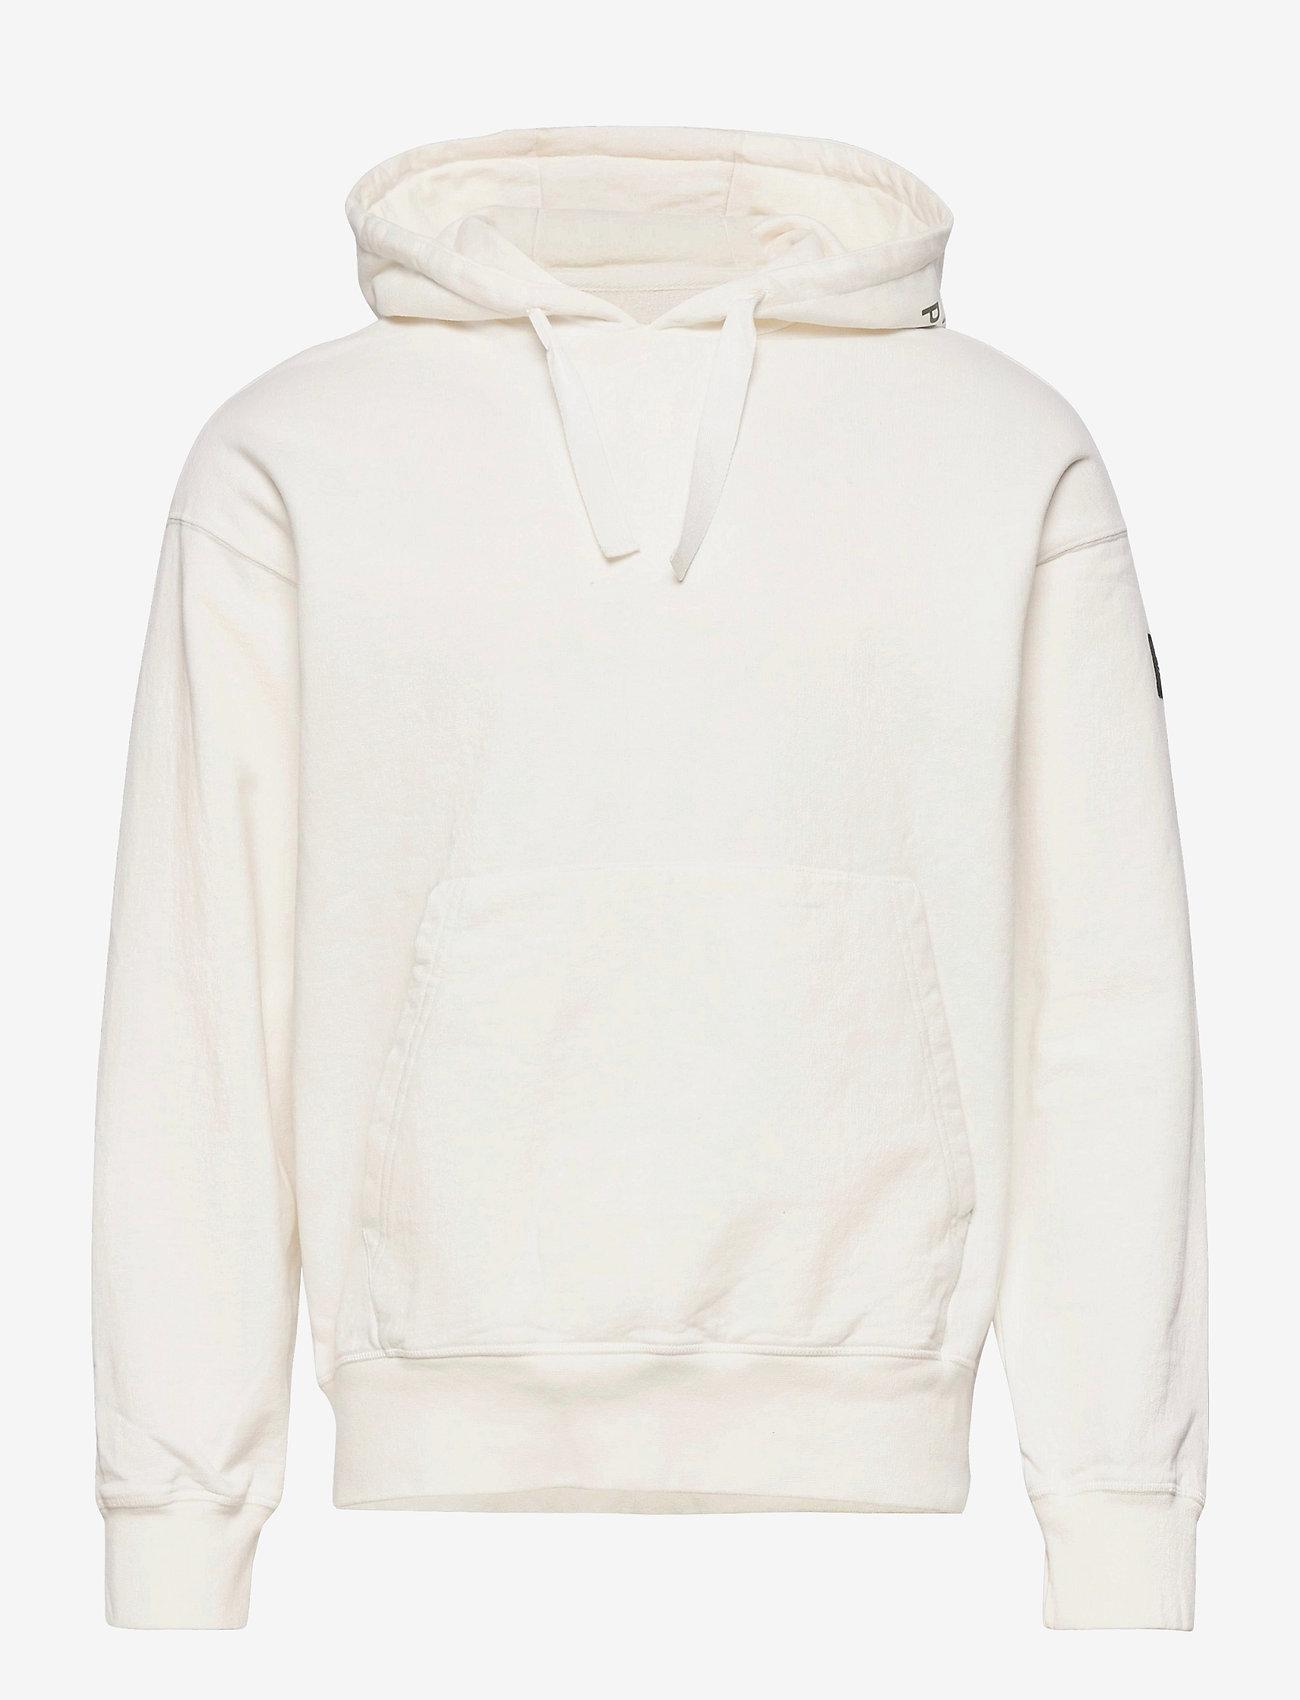 ECOALF - LUCCA SWEATSHIRT MAN - hoodies - off white - 0